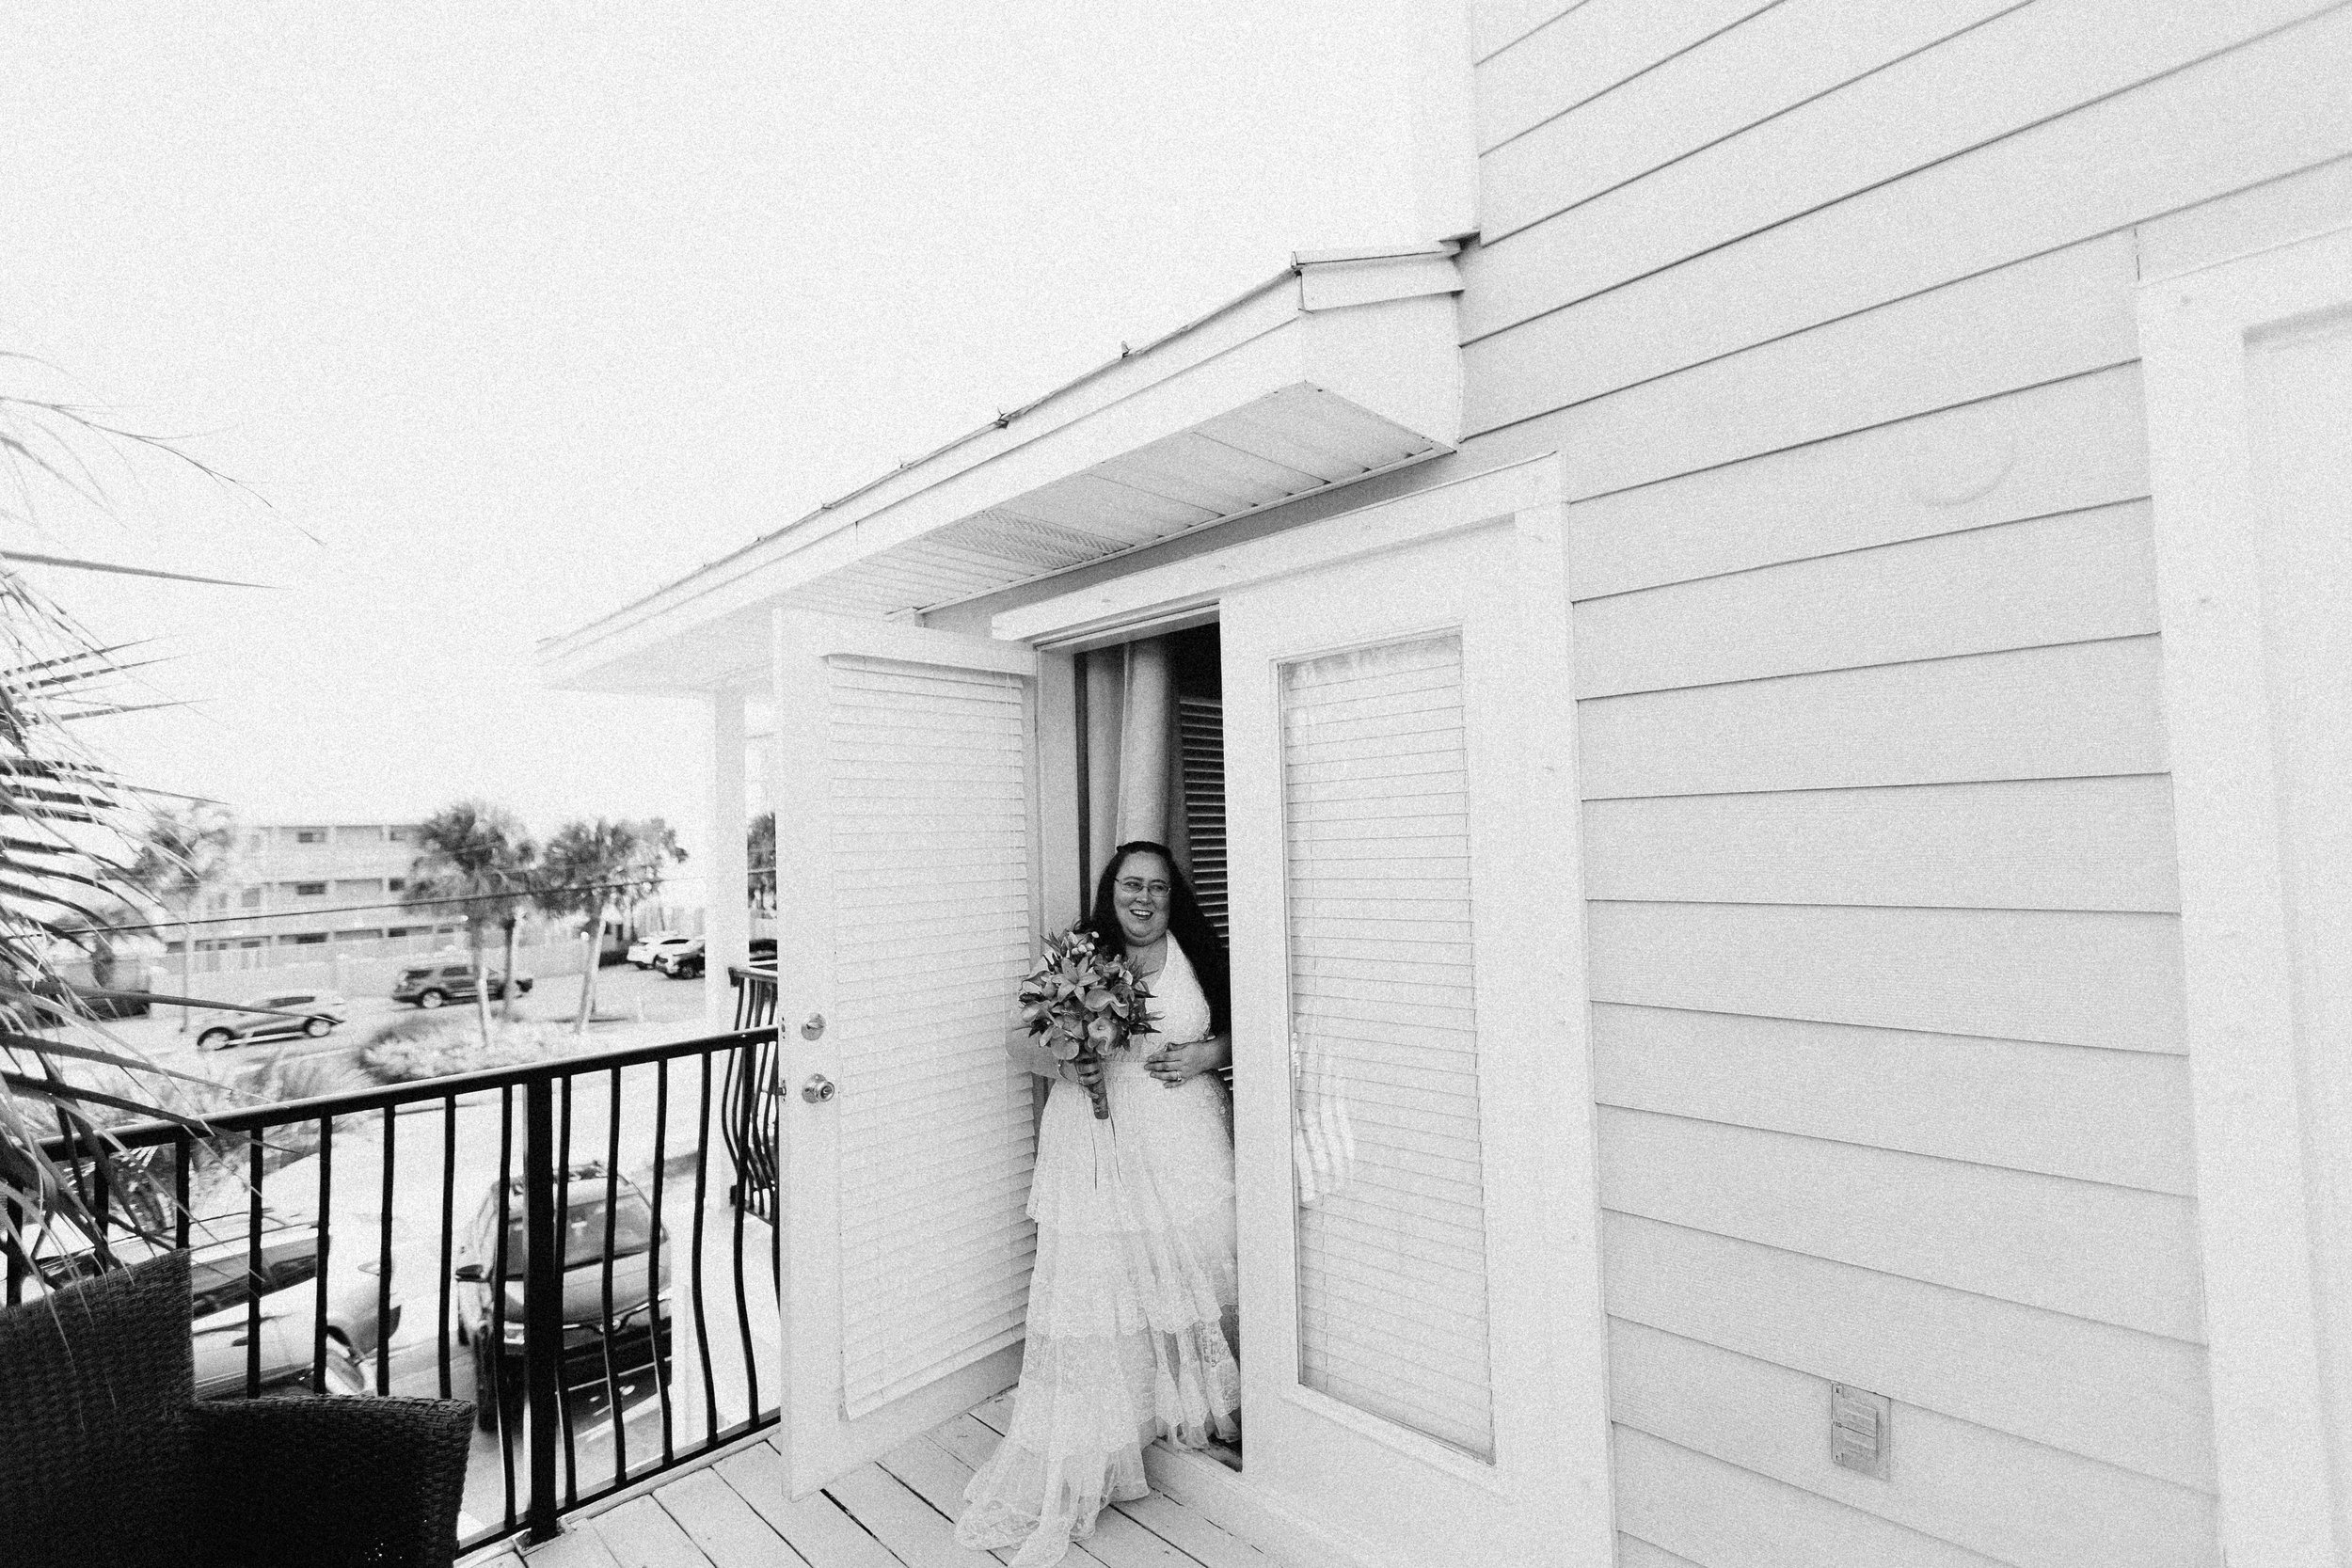 destin_sunset_beach_elopement_intimate_wedding_photographer_florida_documentary_1051.jpg